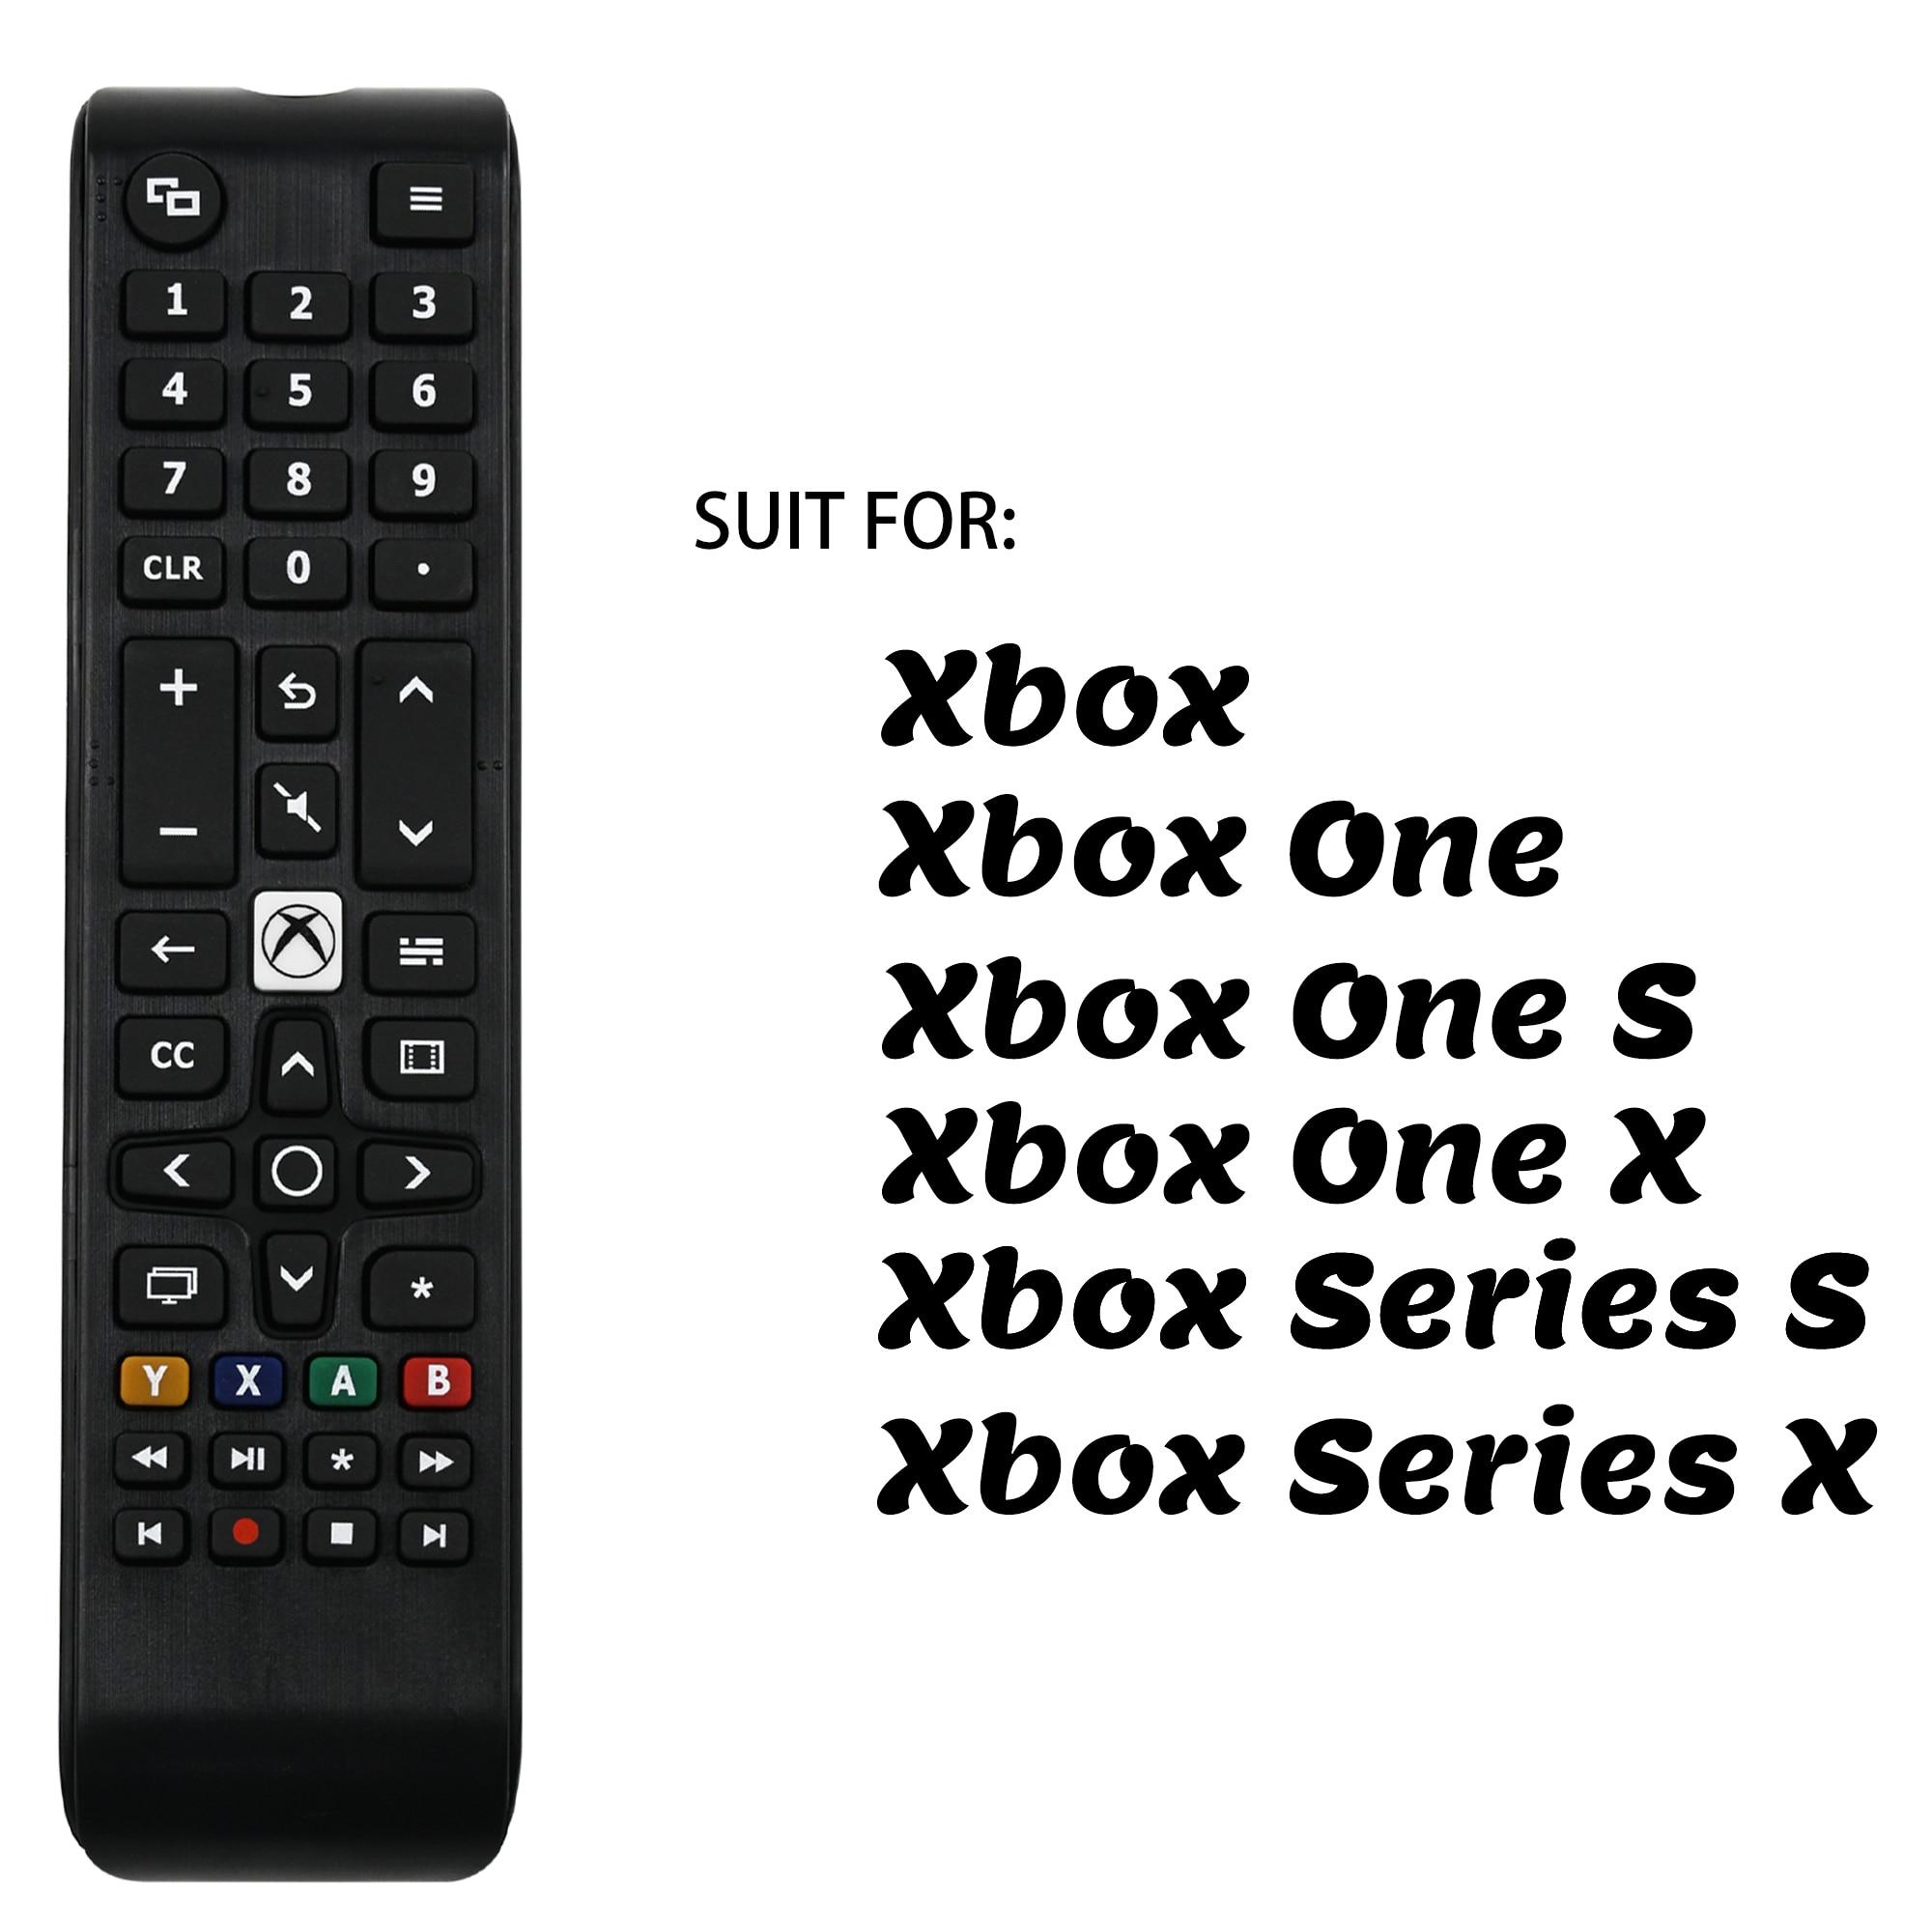 game deals xbox conan exiles xbox one Remote Control for Xbox One Dvd Entertainment Multimedia Controle Controller for Microsoft Xbox One Game Console